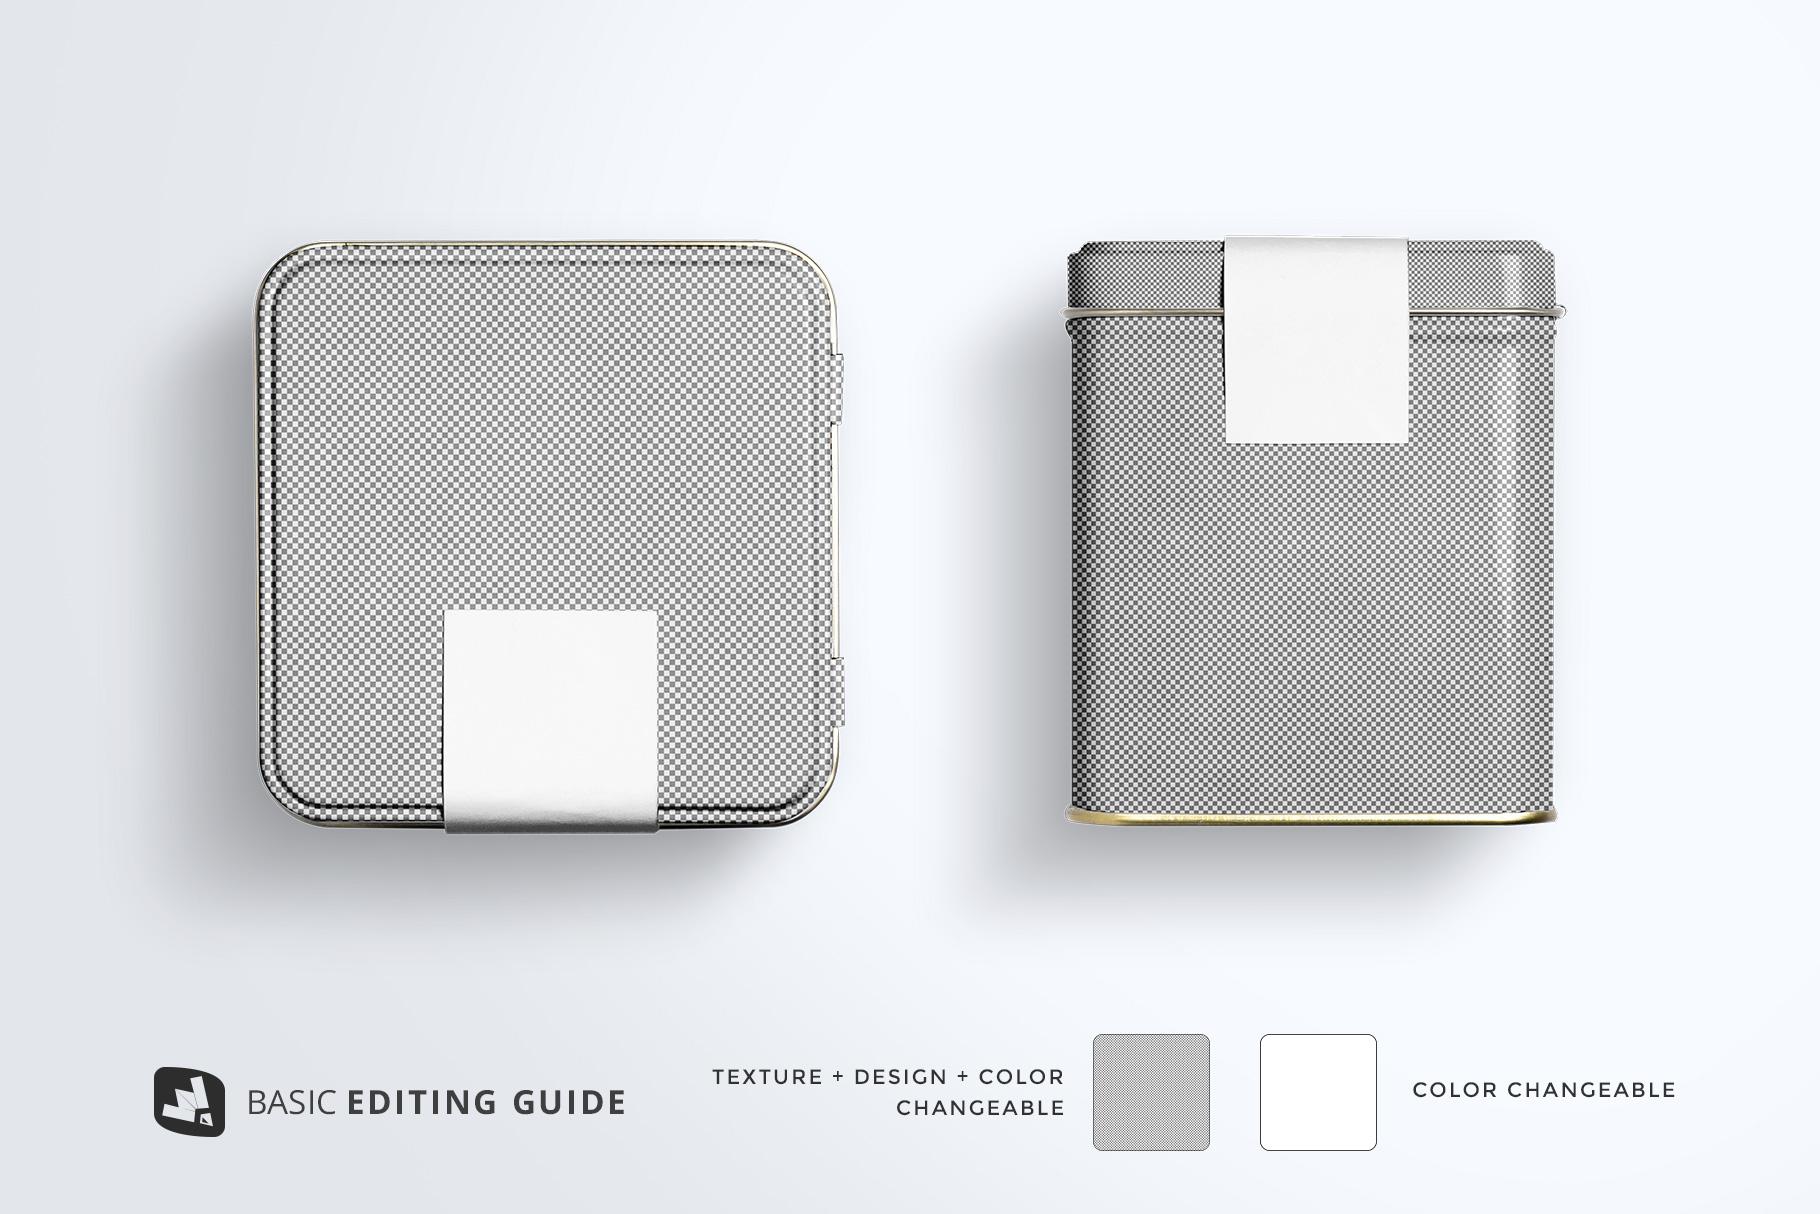 editability of the organic tea tin box packaging mockup